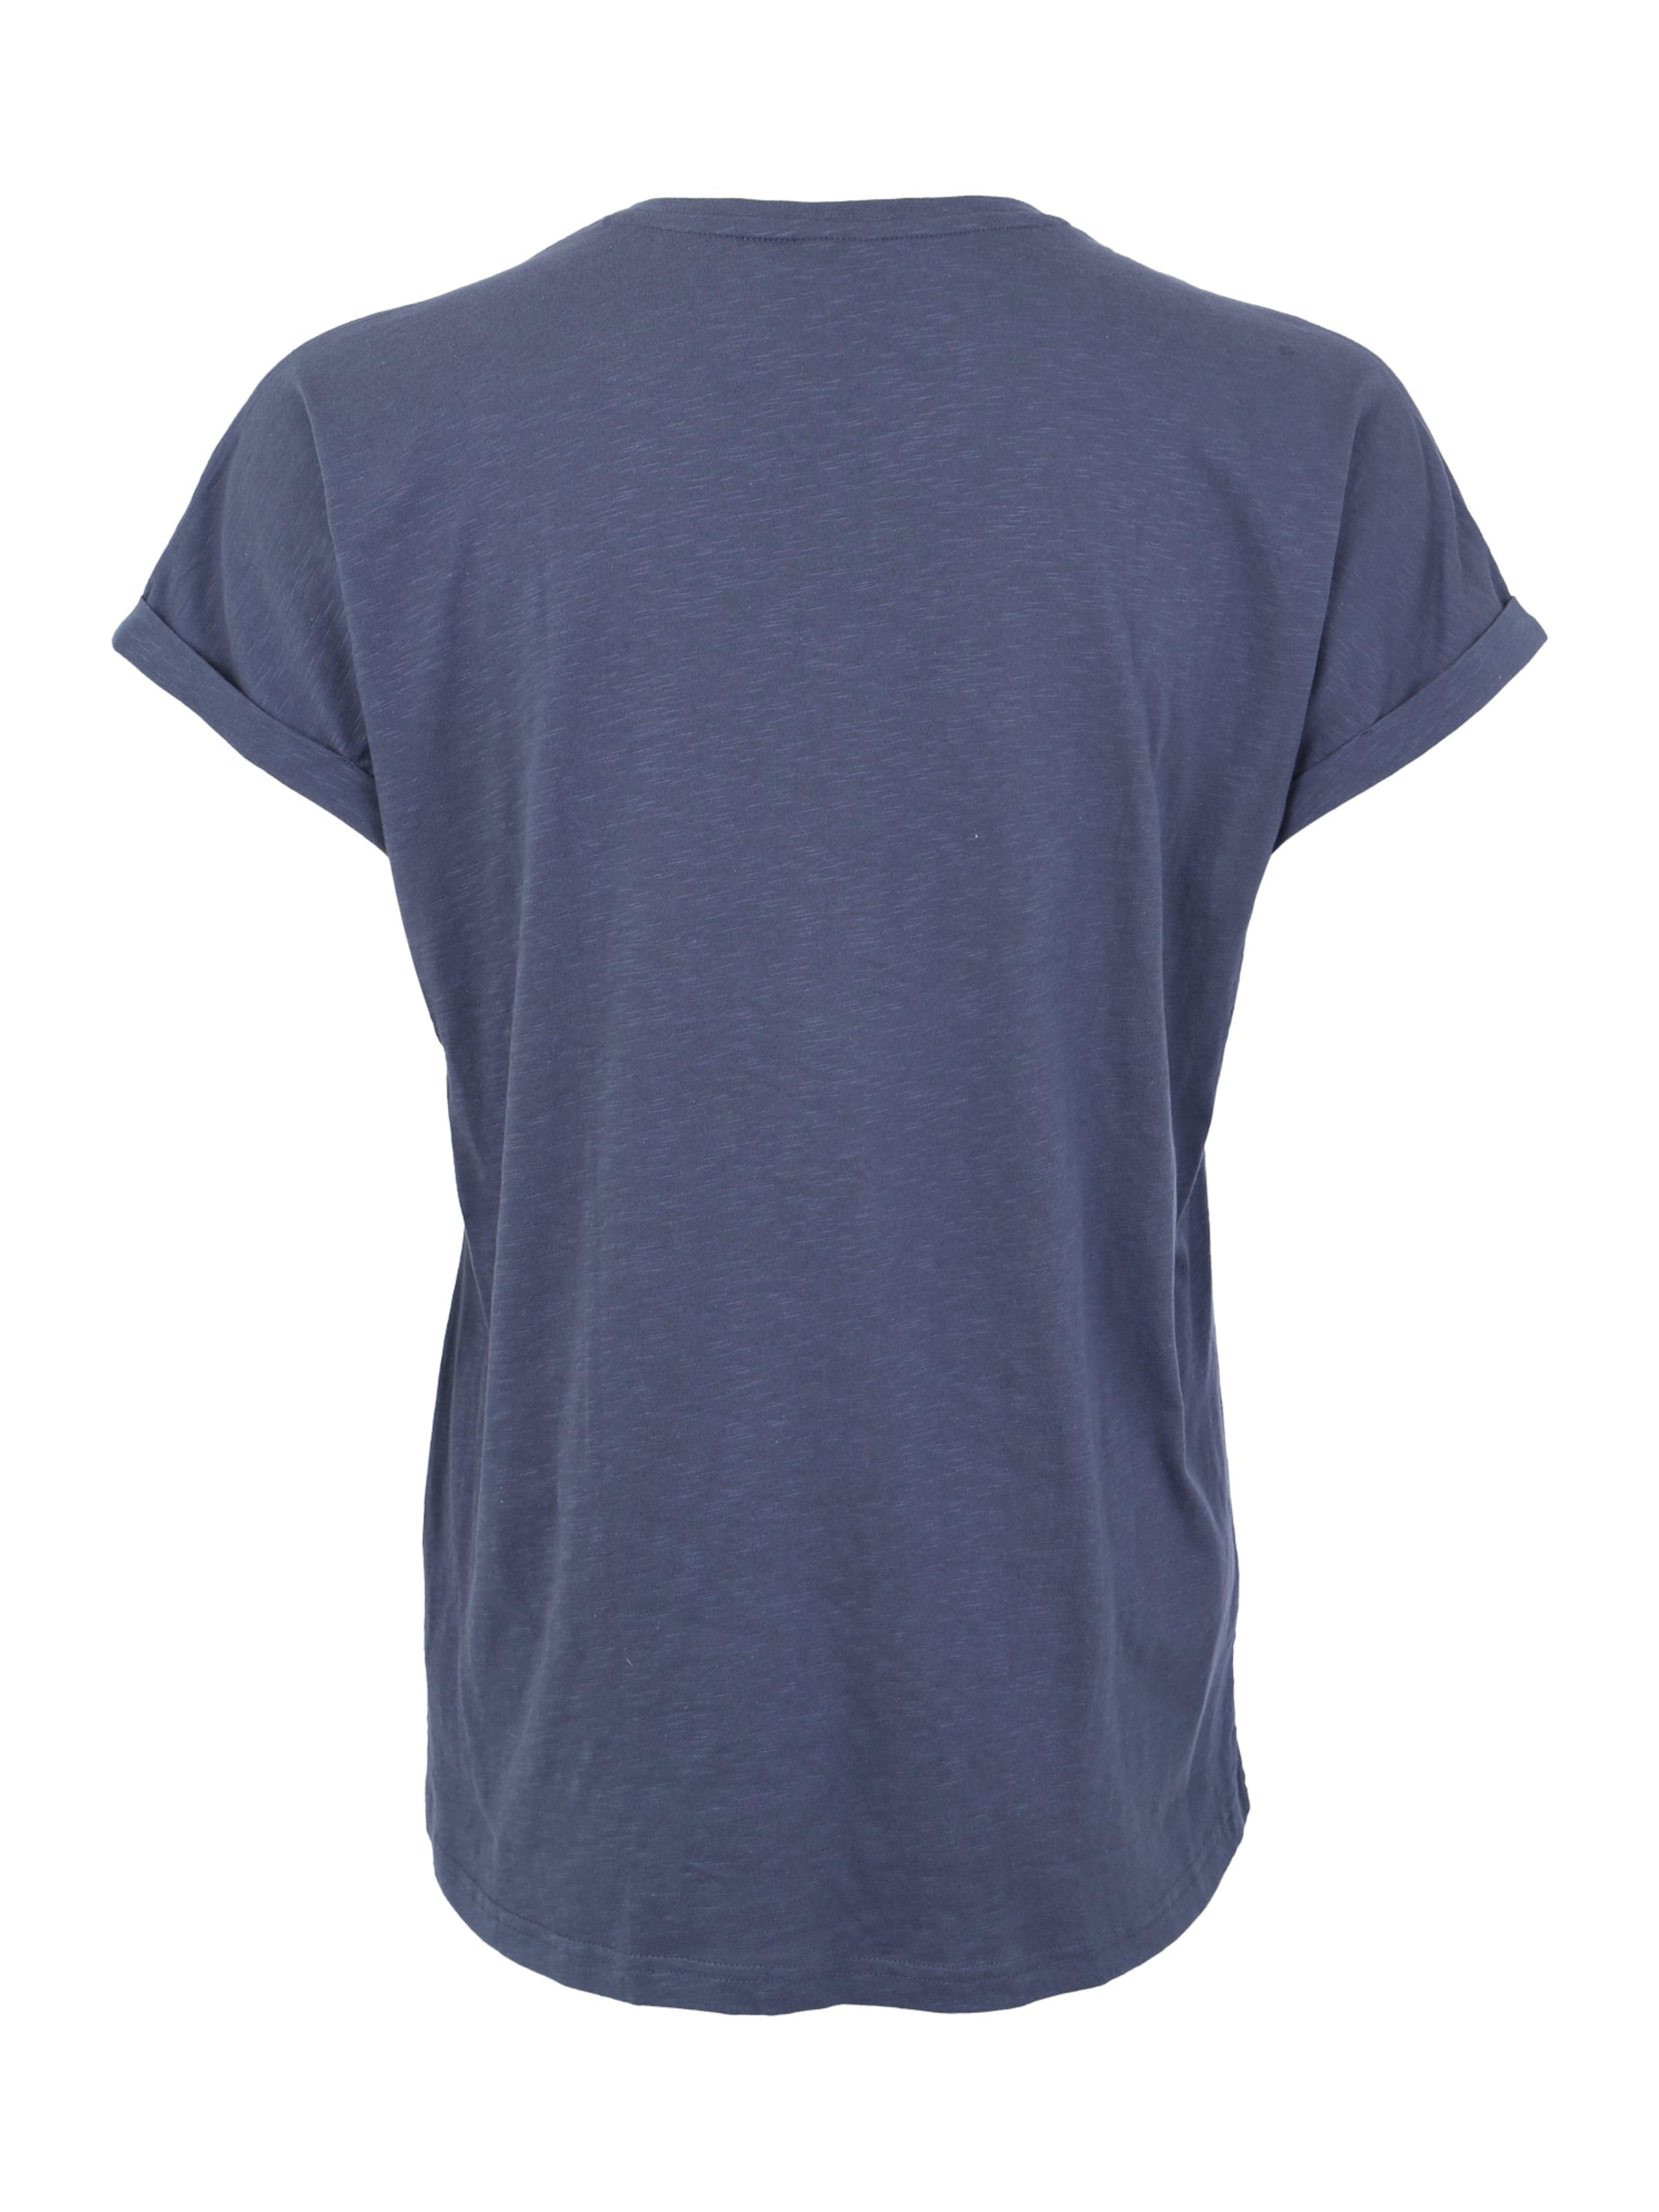 'mafia' En Indigo Zizzi T shirt byf76g